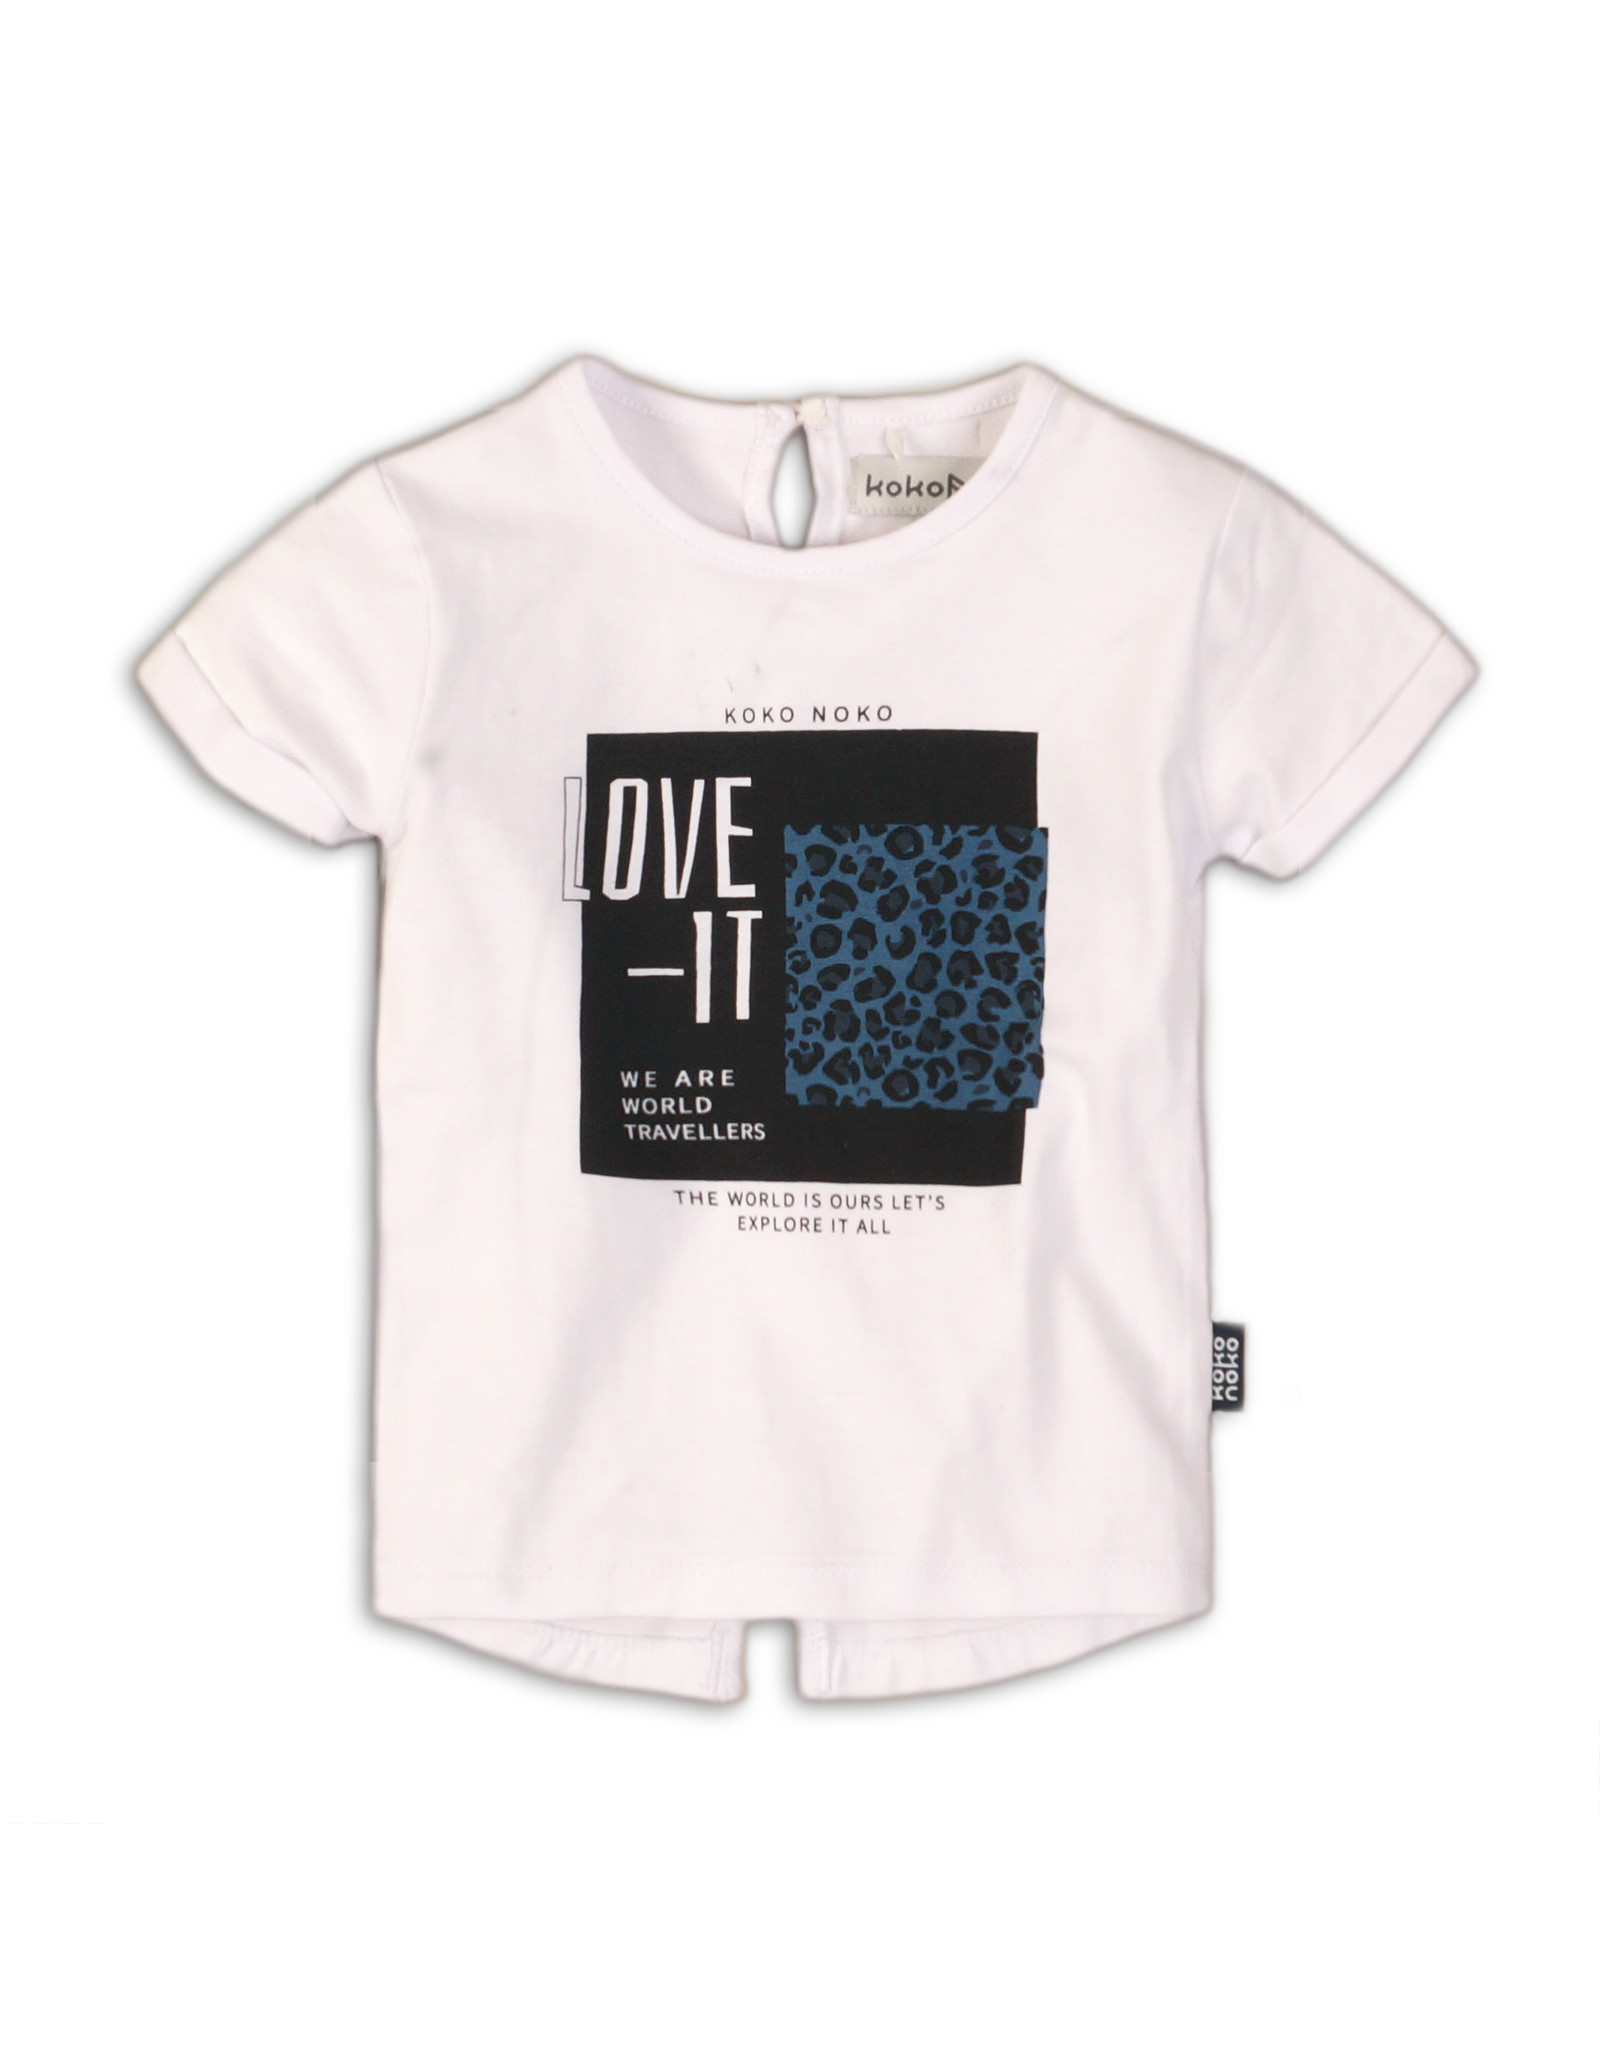 Koko Noko t shirt, black with white dots, 37C 34918